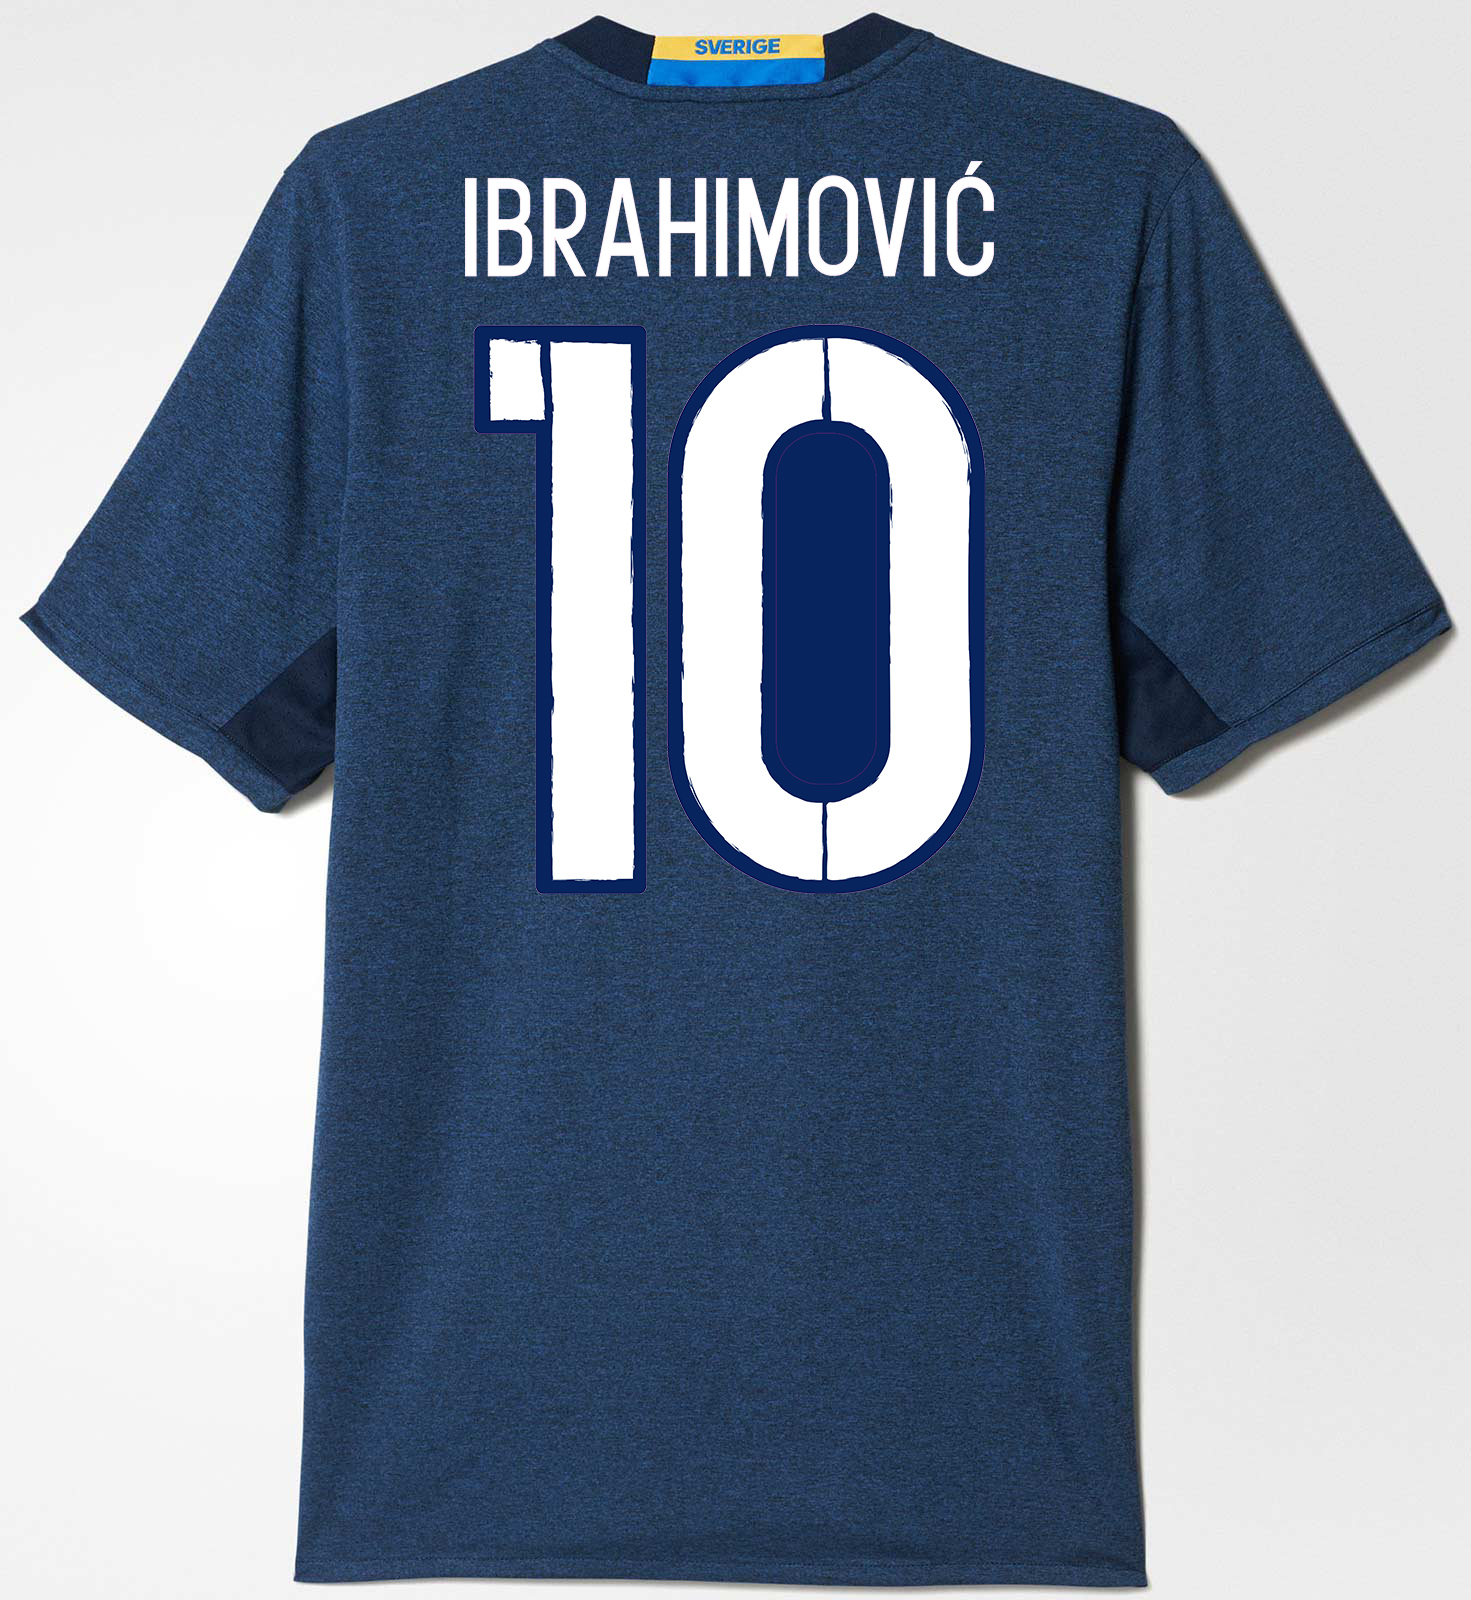 new concept 57e05 a228b Zlatan Ibrahimovic Football Shirts - UKSoccershop.com